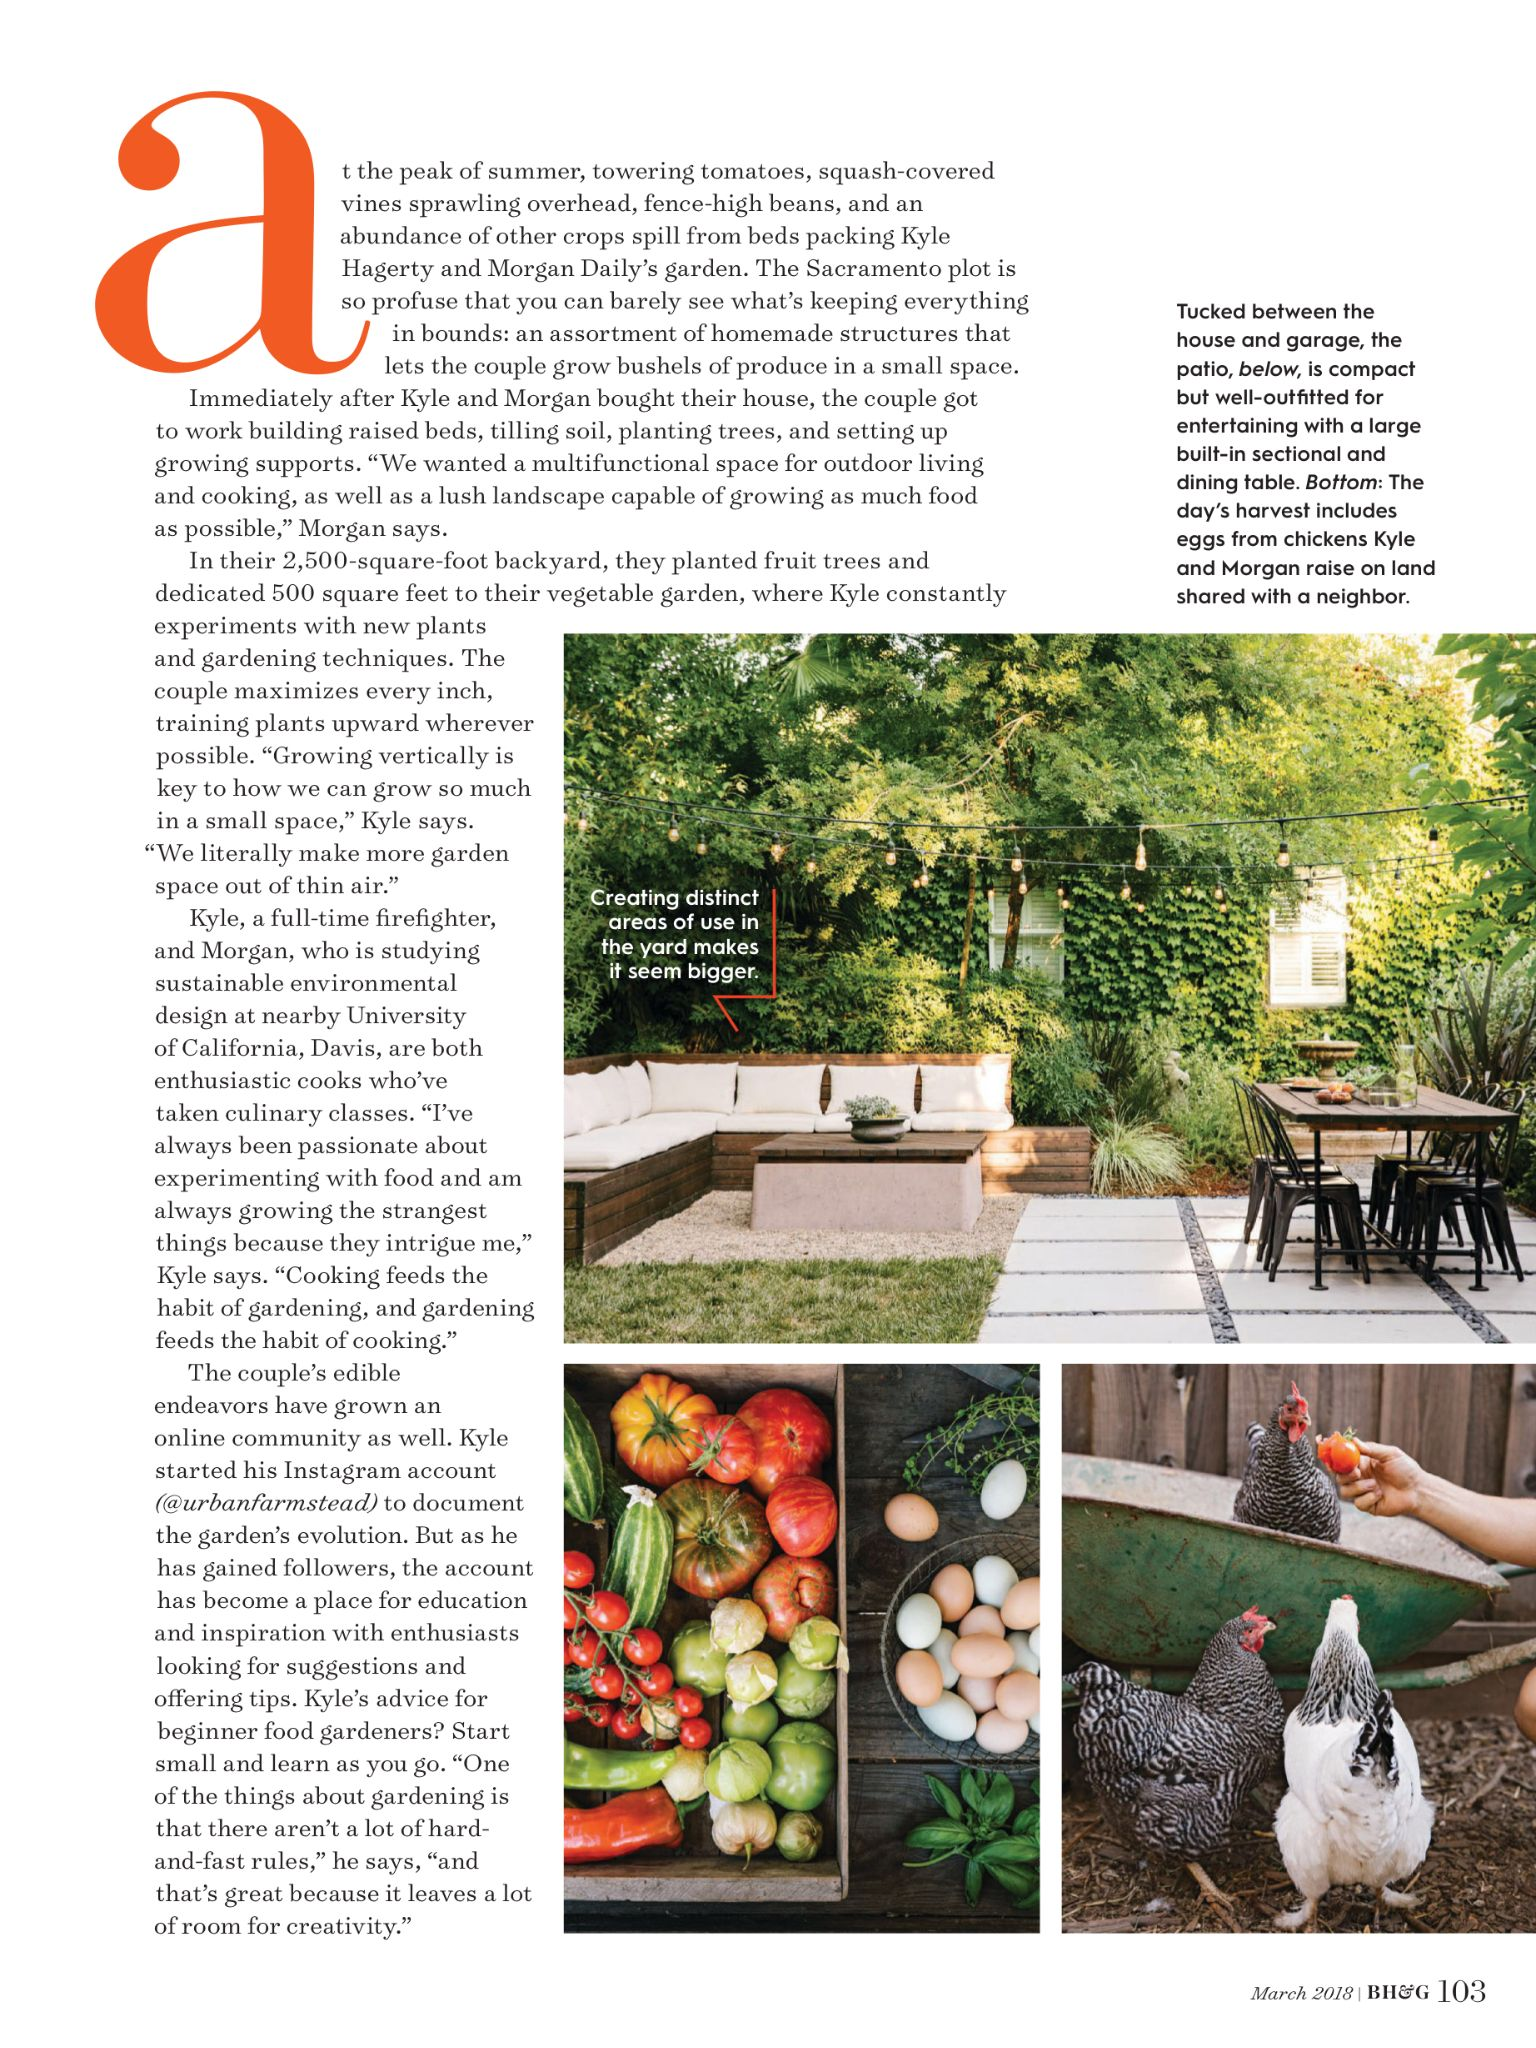 cb2c1298e89b304ebc11e0534e77ff9c - Better Homes And Gardens Covers 2018